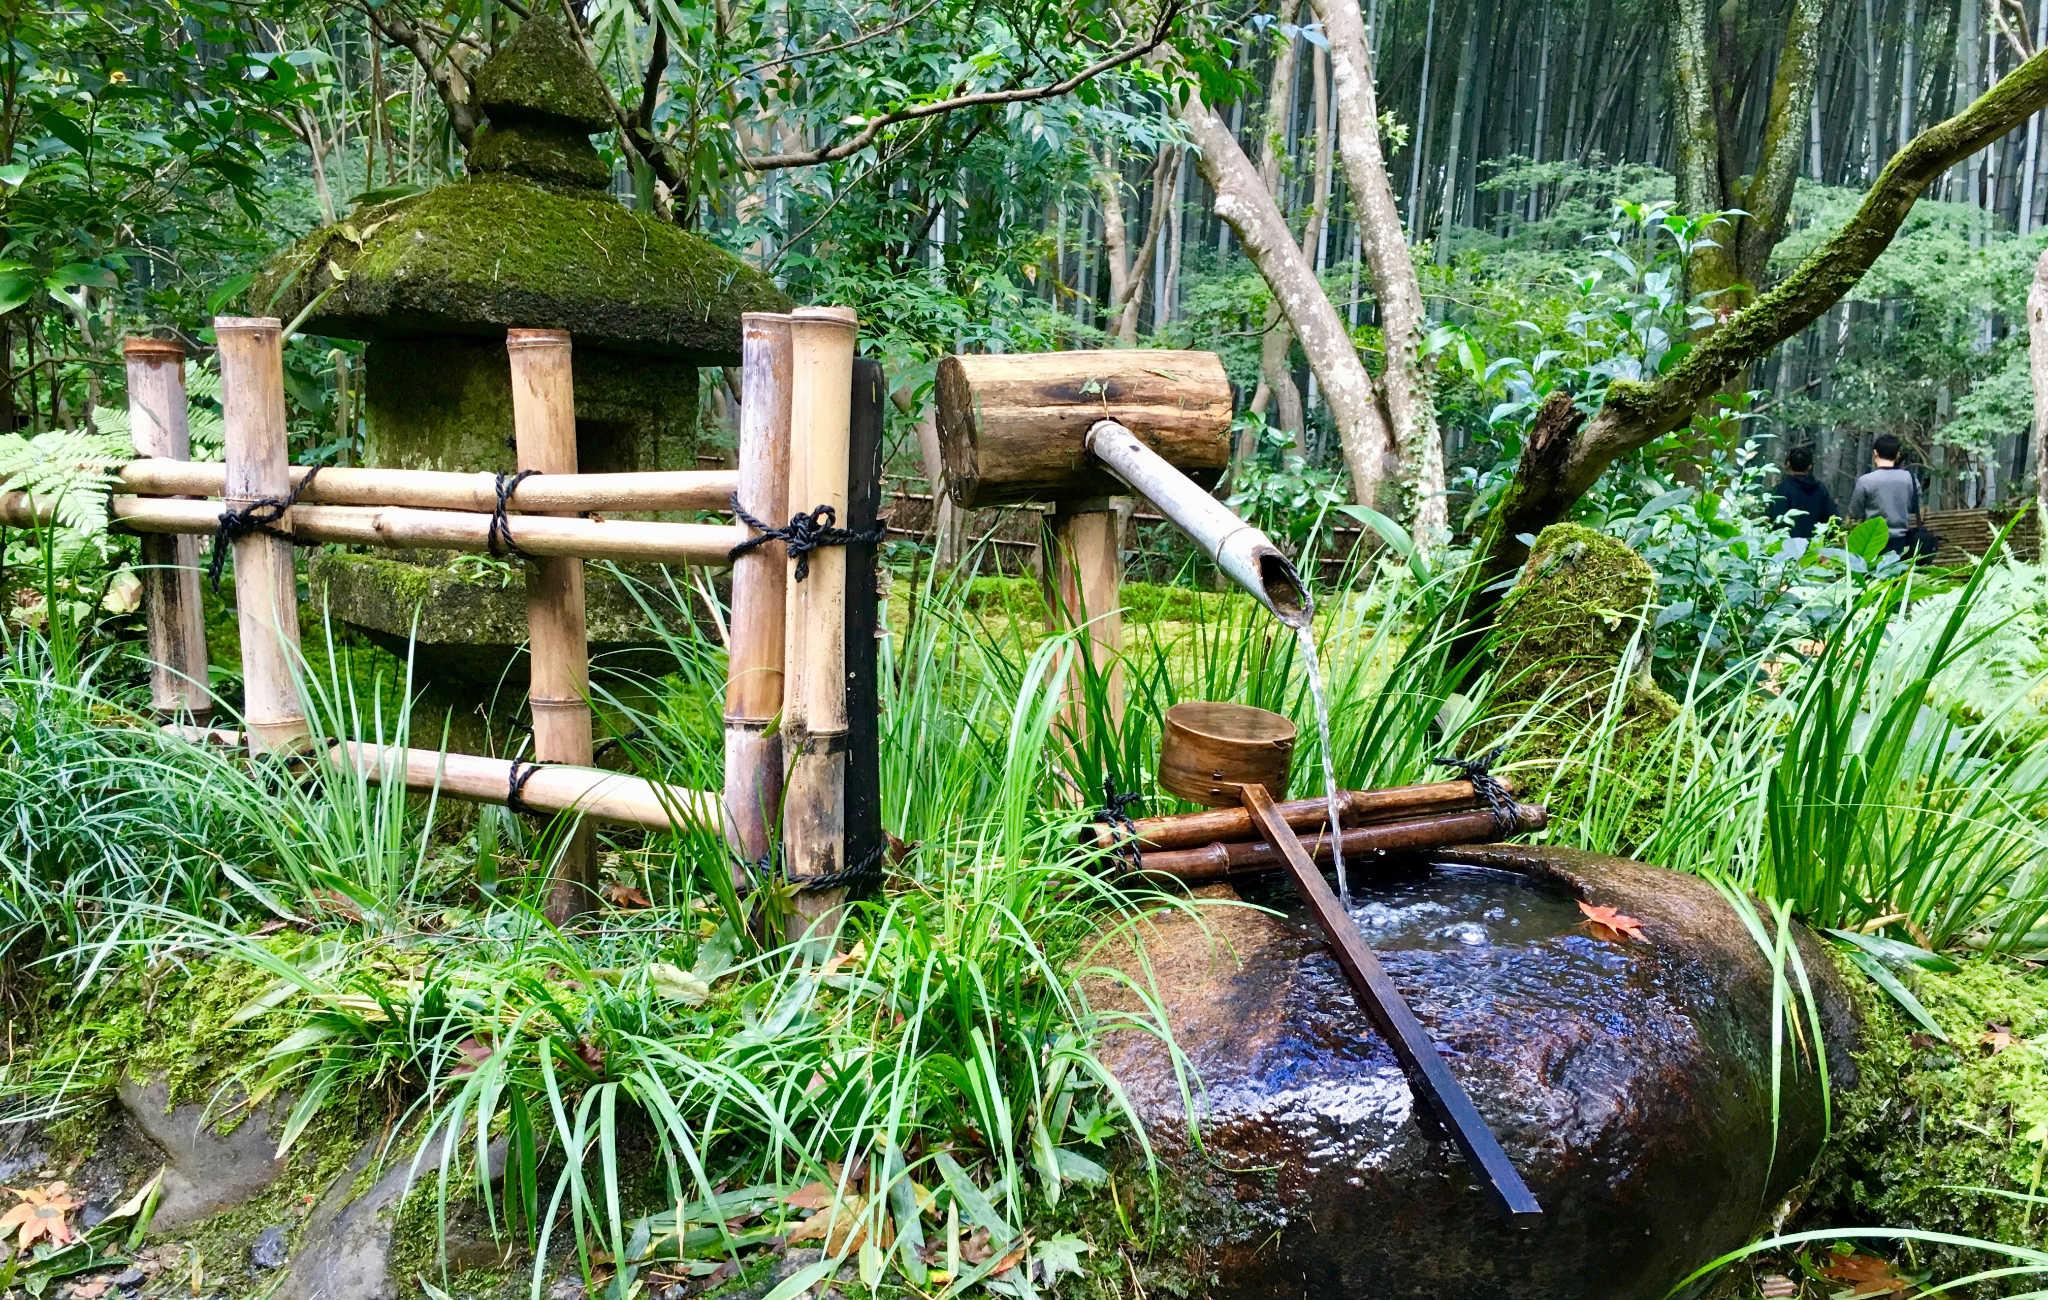 Shishi Odoshi, lanterne, tsukabai et petite clôture en bambou